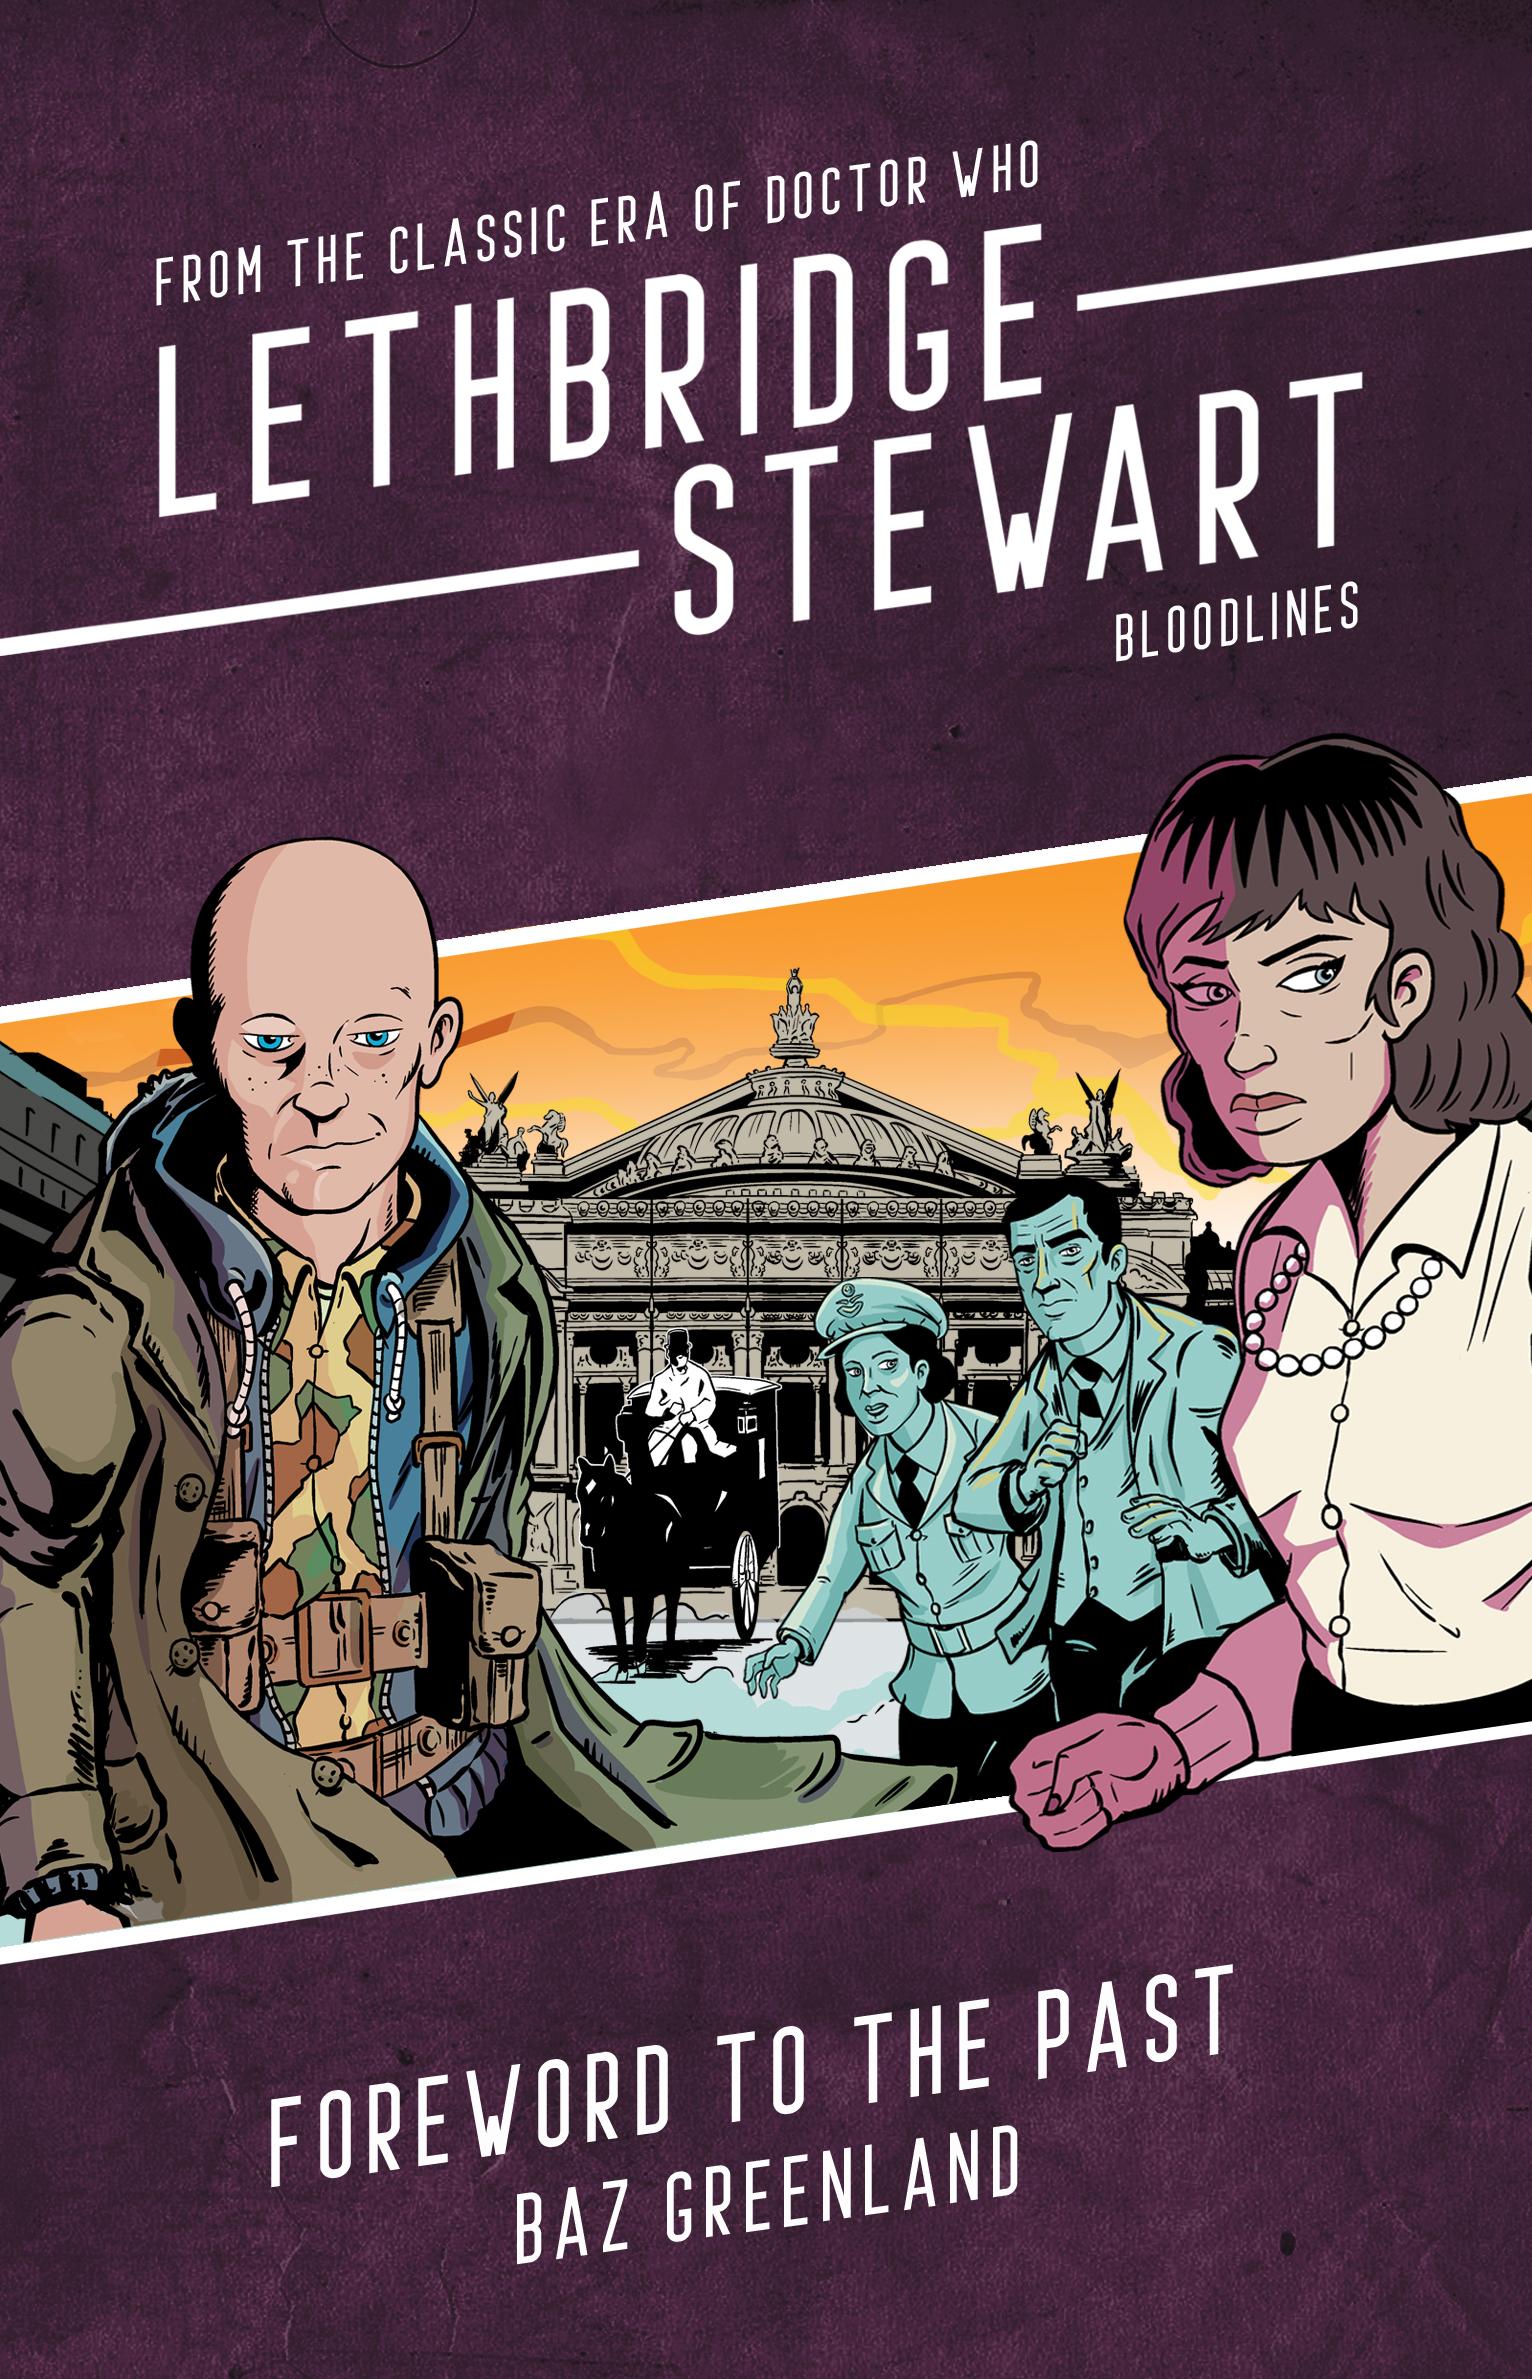 Pre-Order the Final Lethbridge-Stewart: Bloodlines Novel Now from Candy Jar